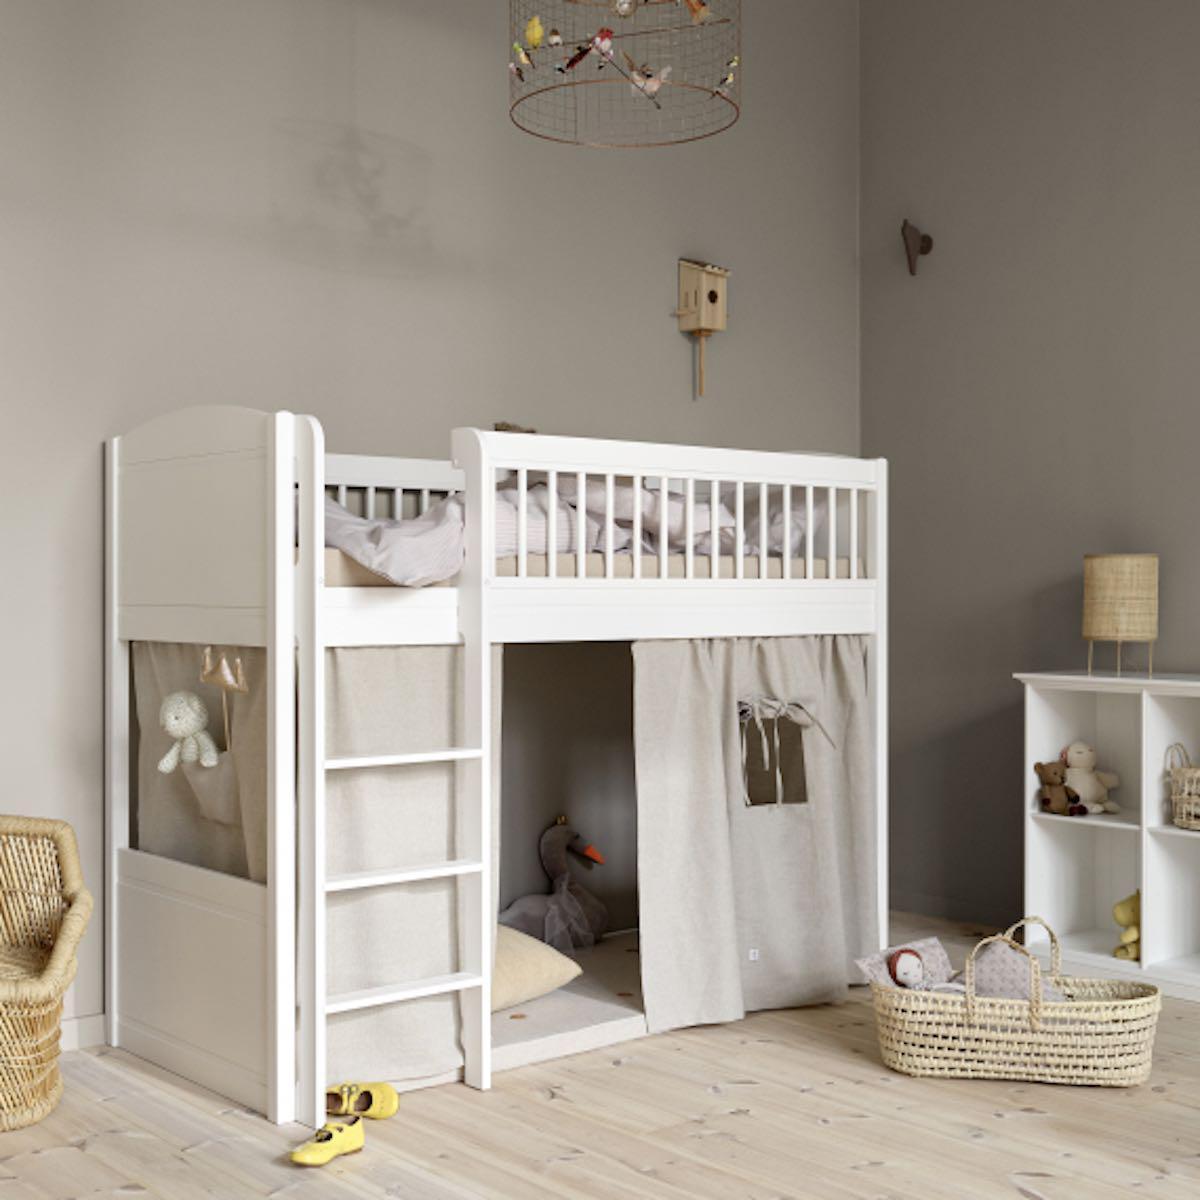 Cama media-alta 68x168cm SEASIDE LILLE+ Oliver Furniture blanco